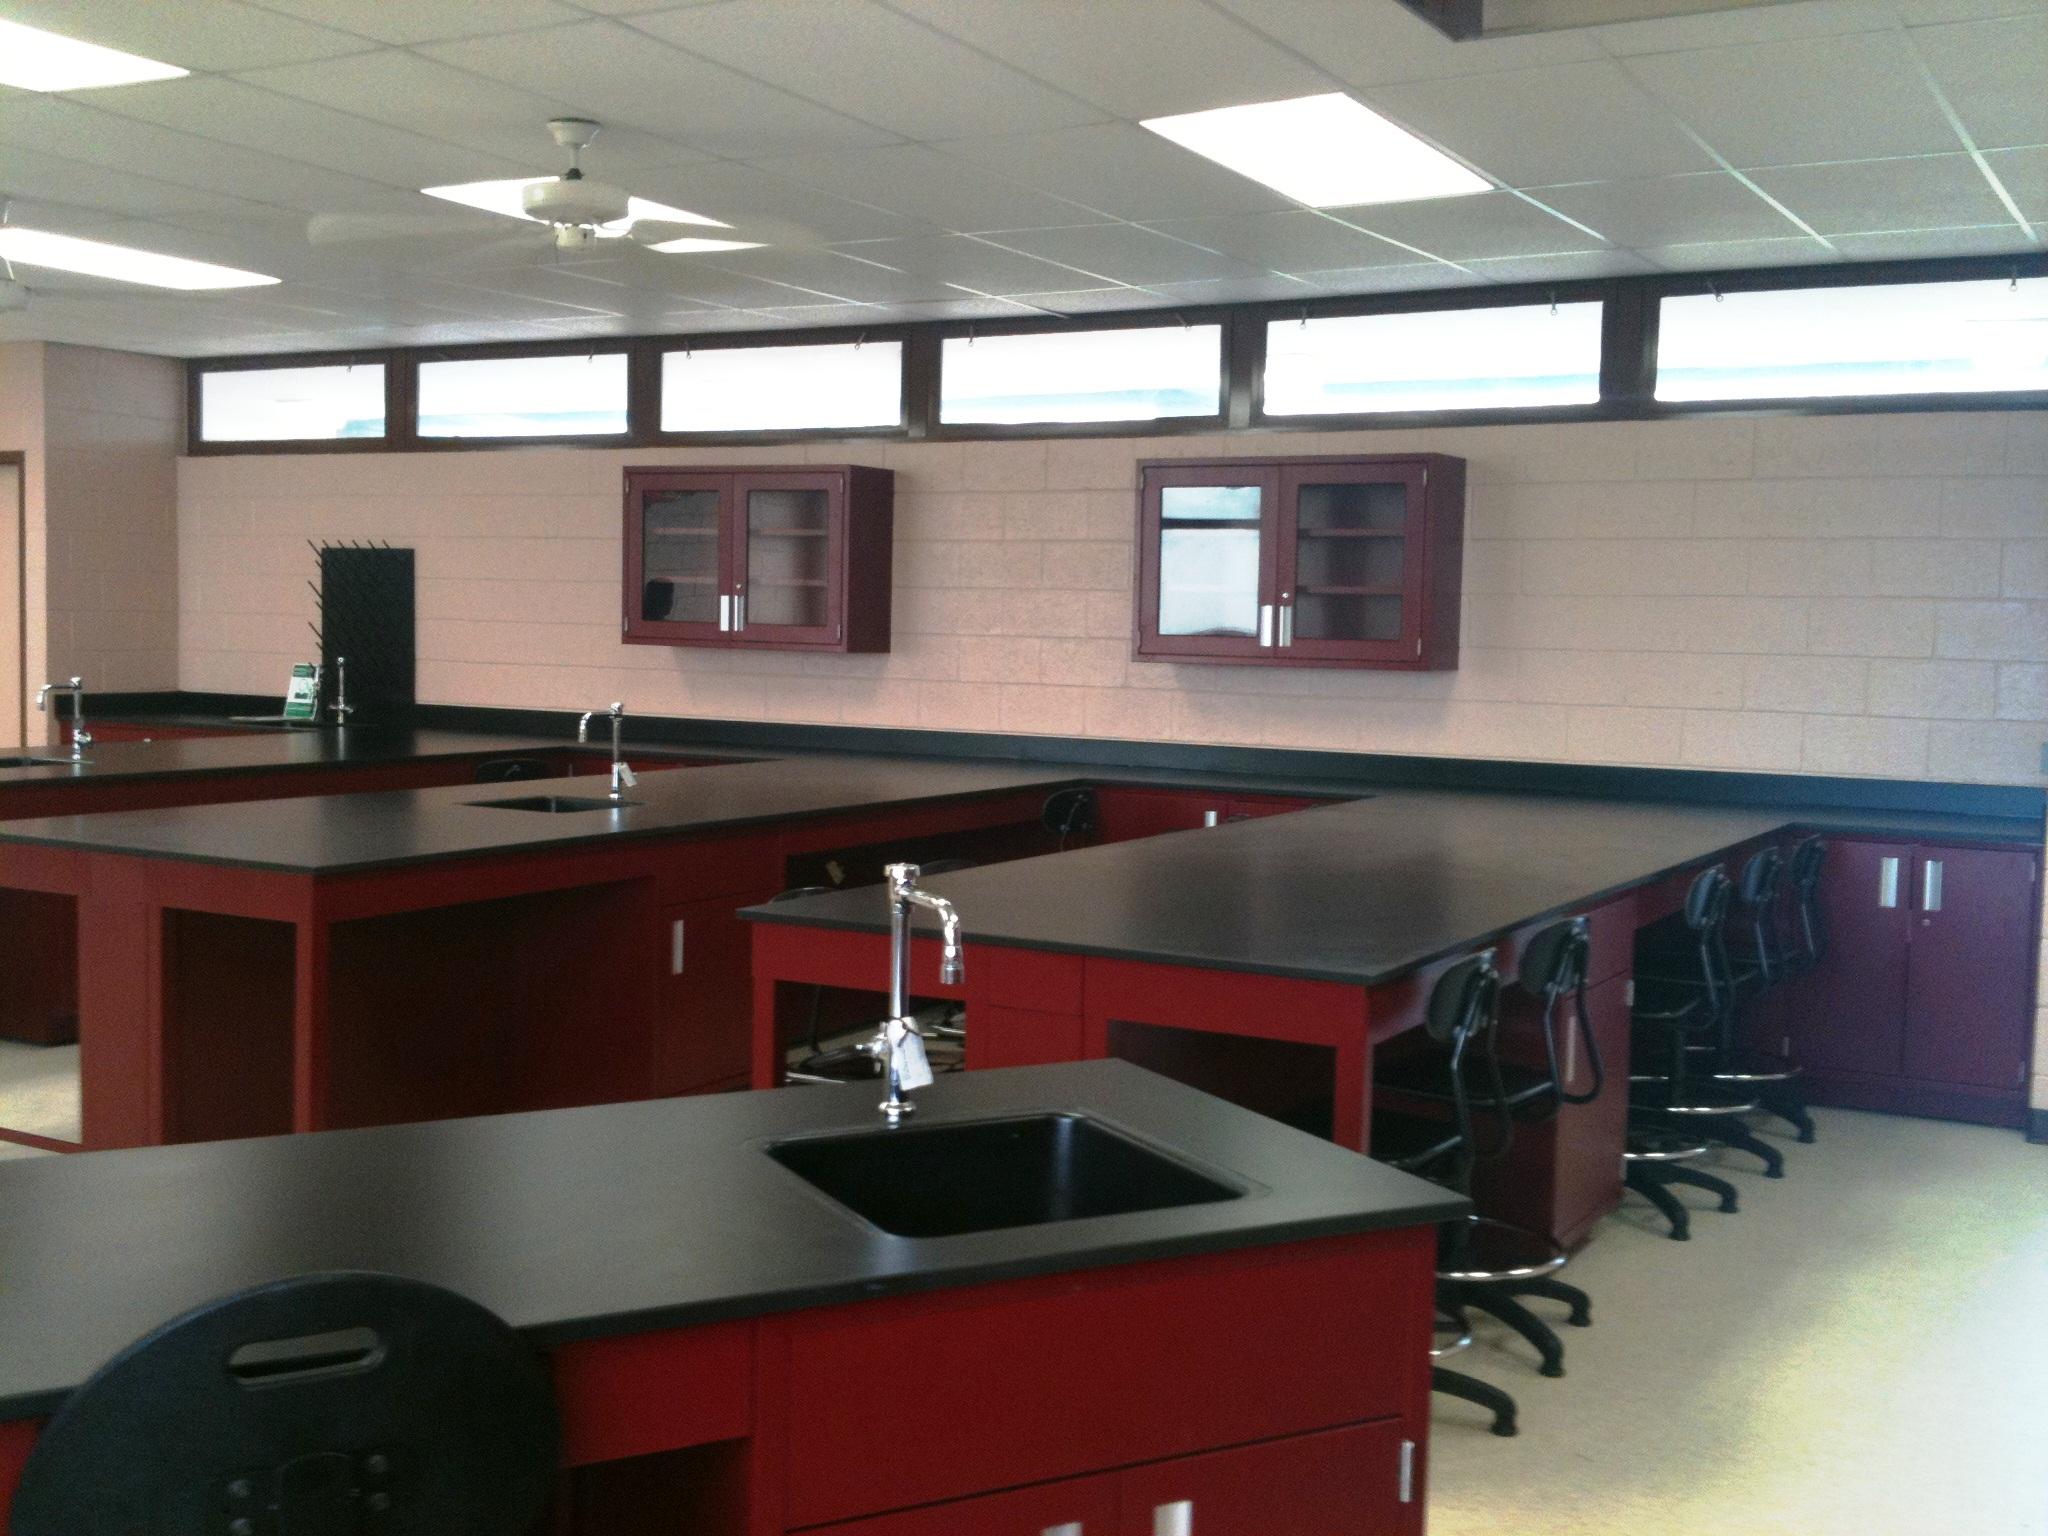 Trespa Countertops Phenolic Resin Countertops Loc